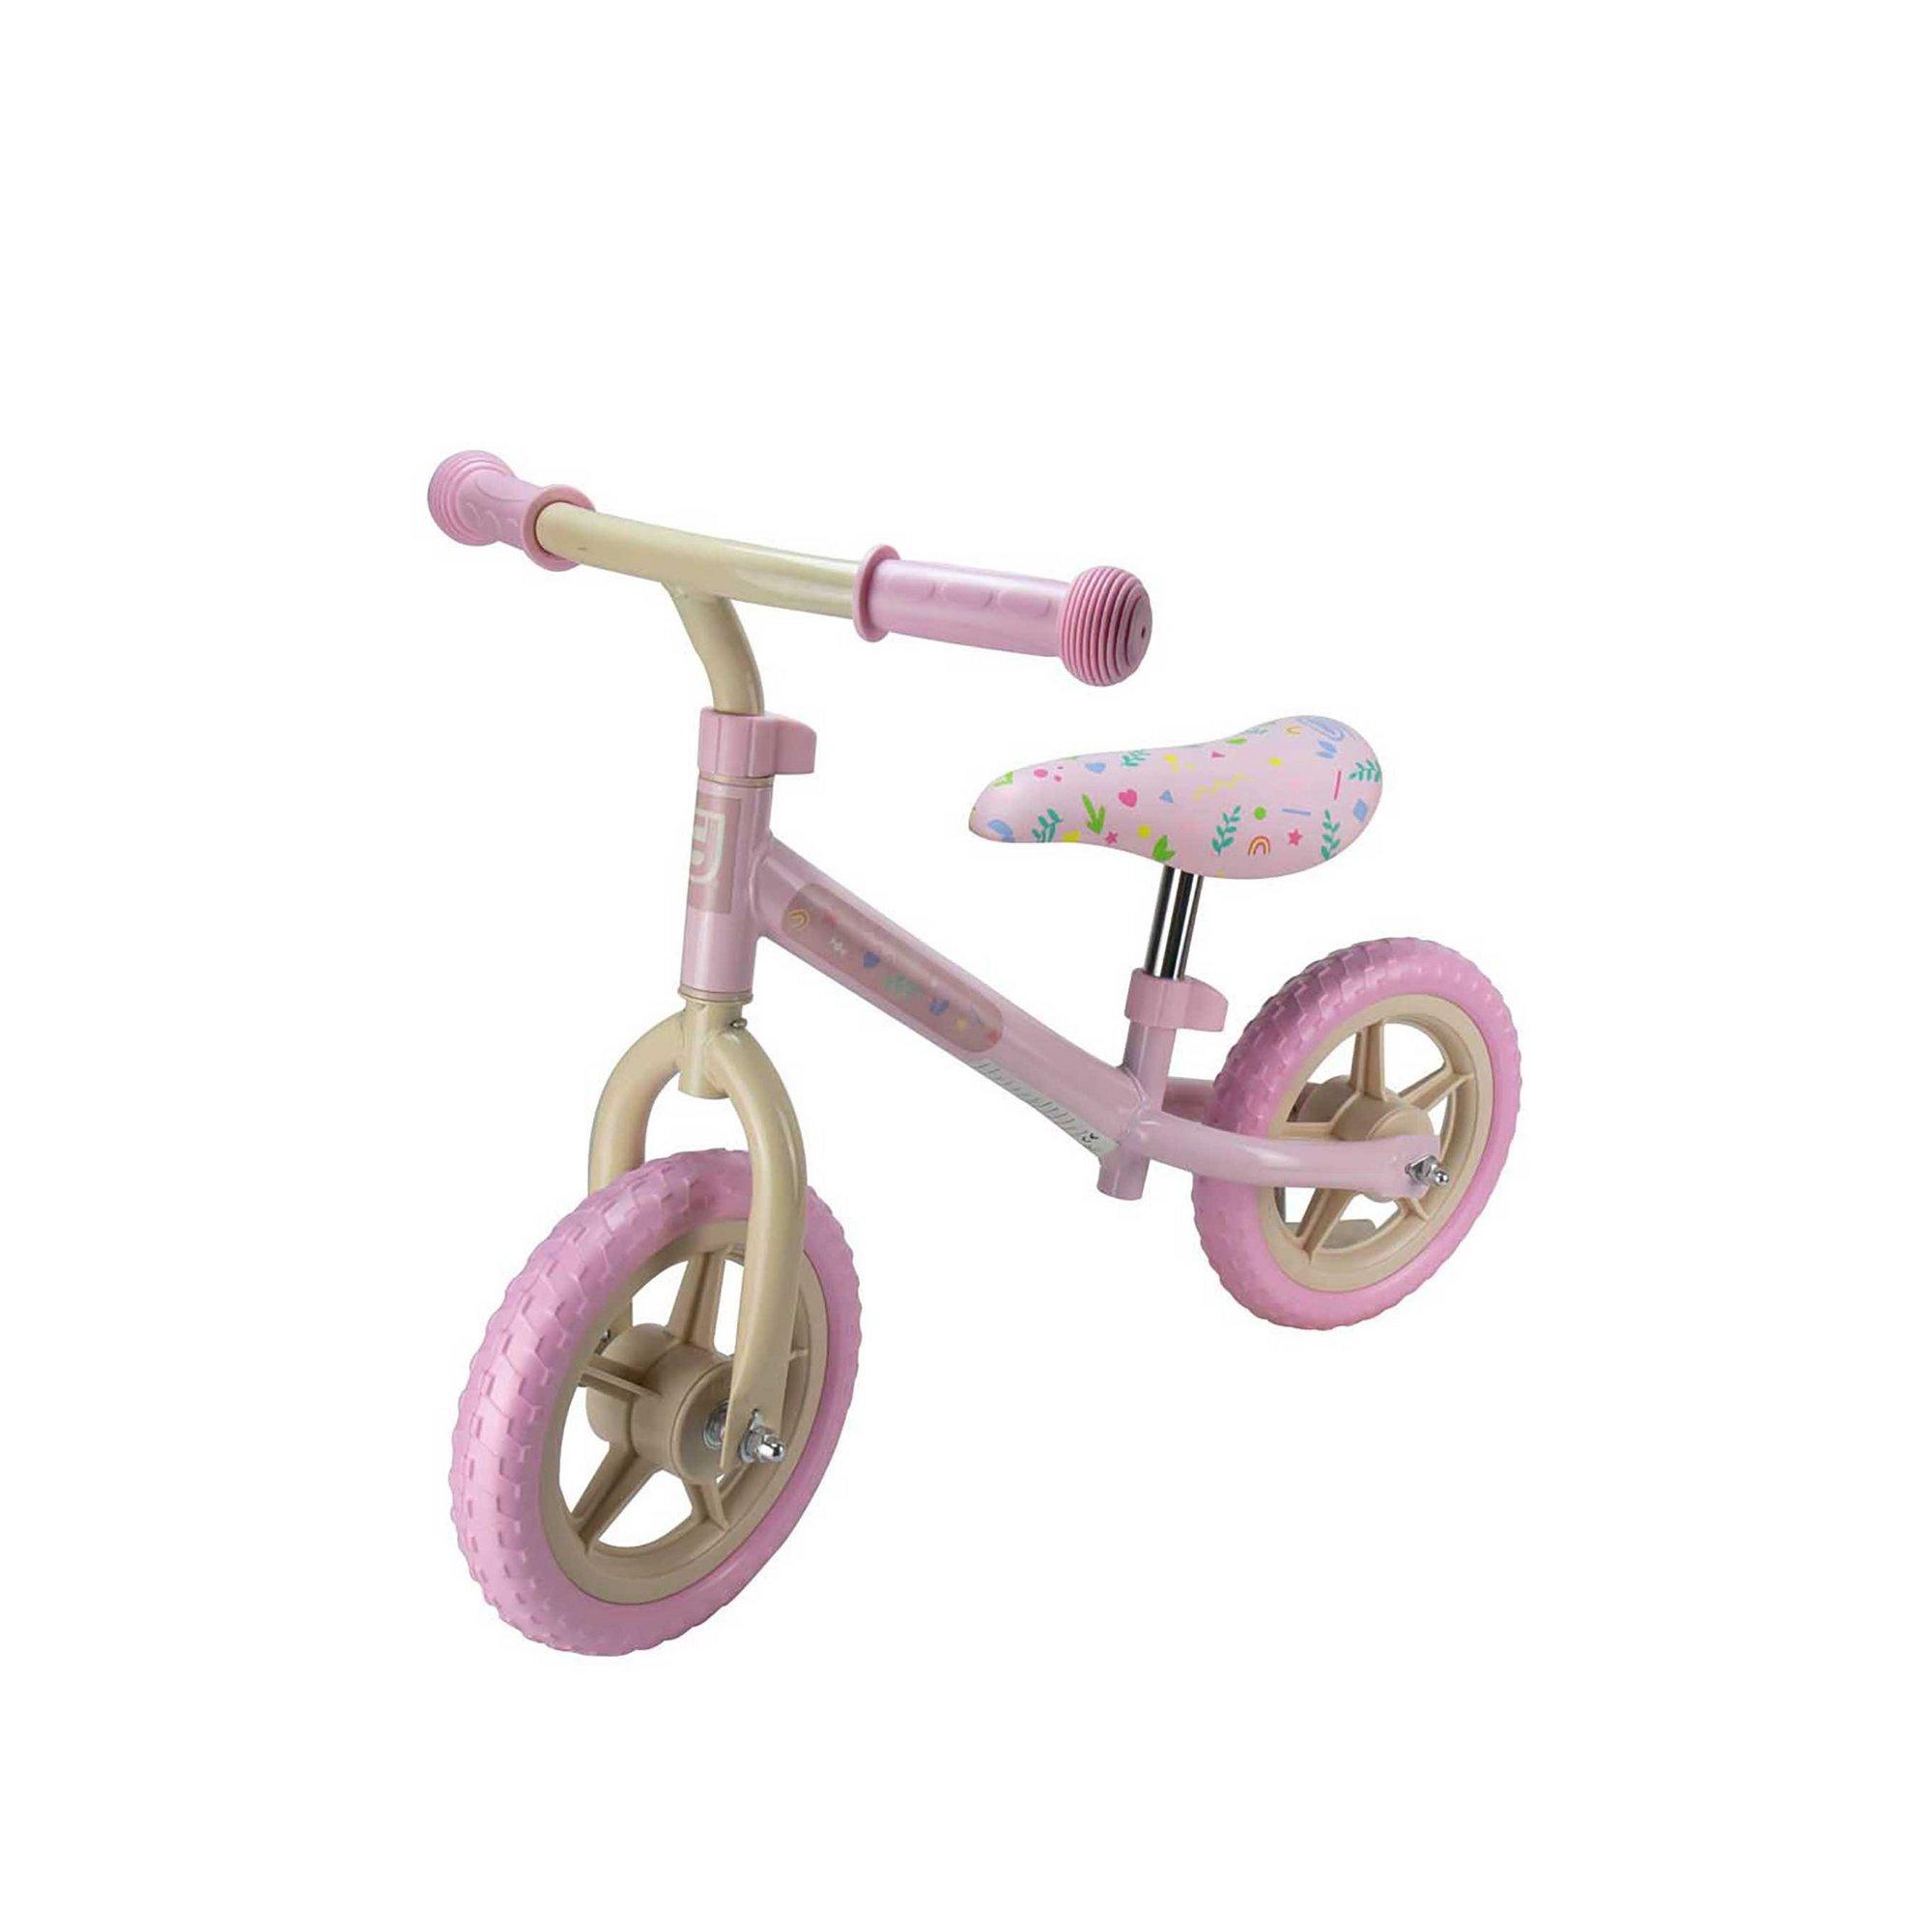 Image of Funbee Childrens Metal Balance Bike